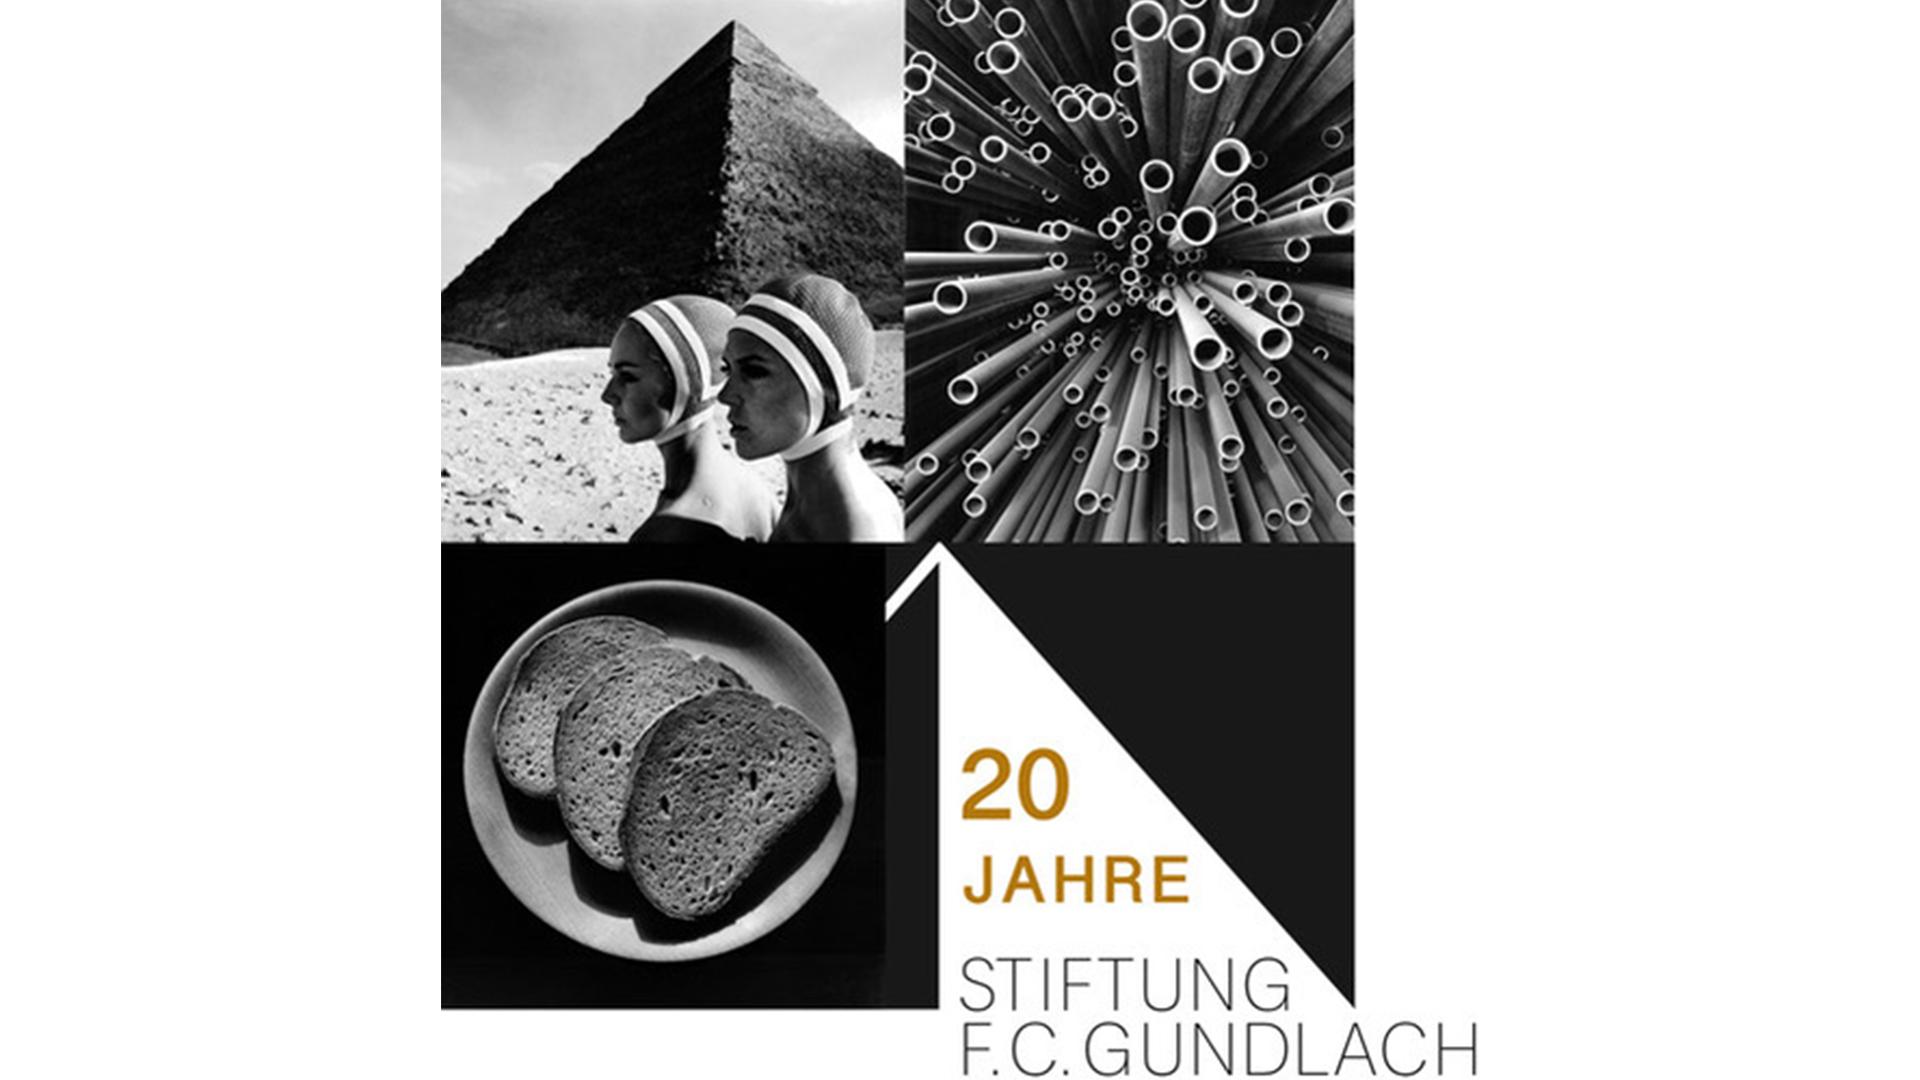 20 Jahre Stiftung F.C. Gundlach